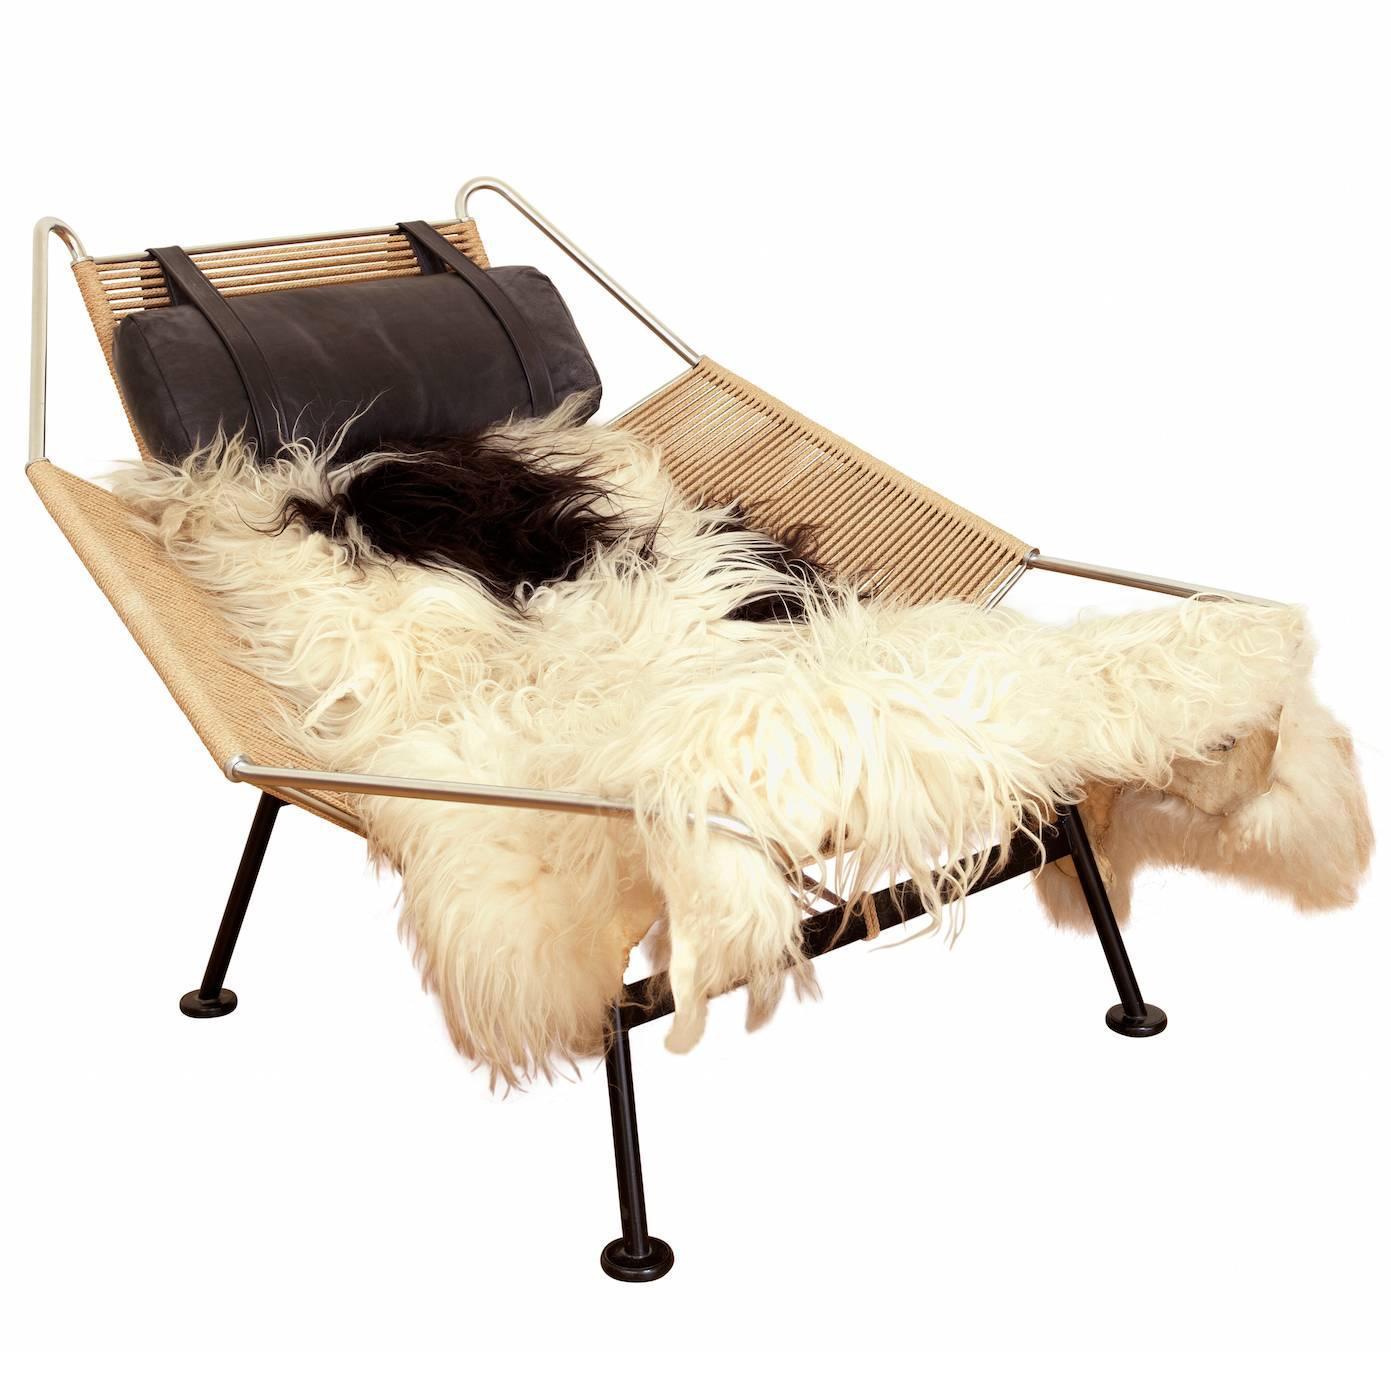 "Flag Halyard"" Lounge Chair by Hans J Wegner at 1stdibs"